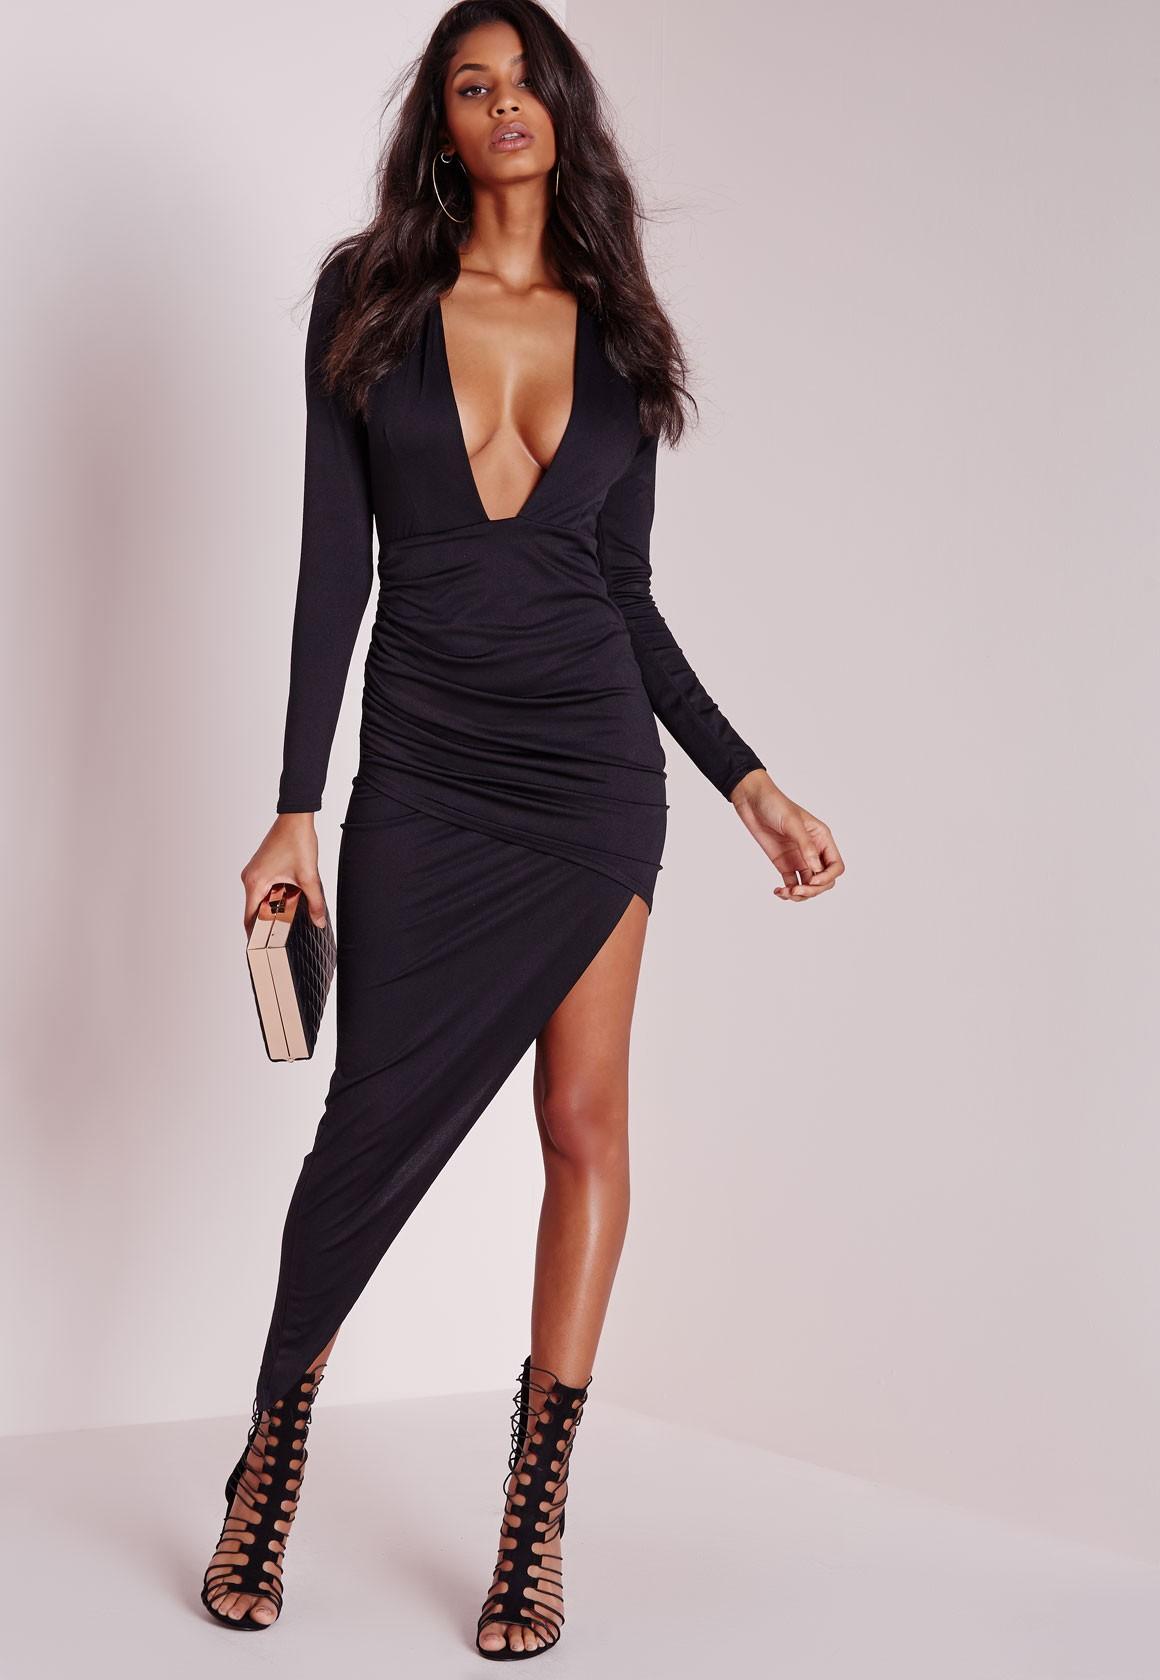 elegant woman dresses photo - 1